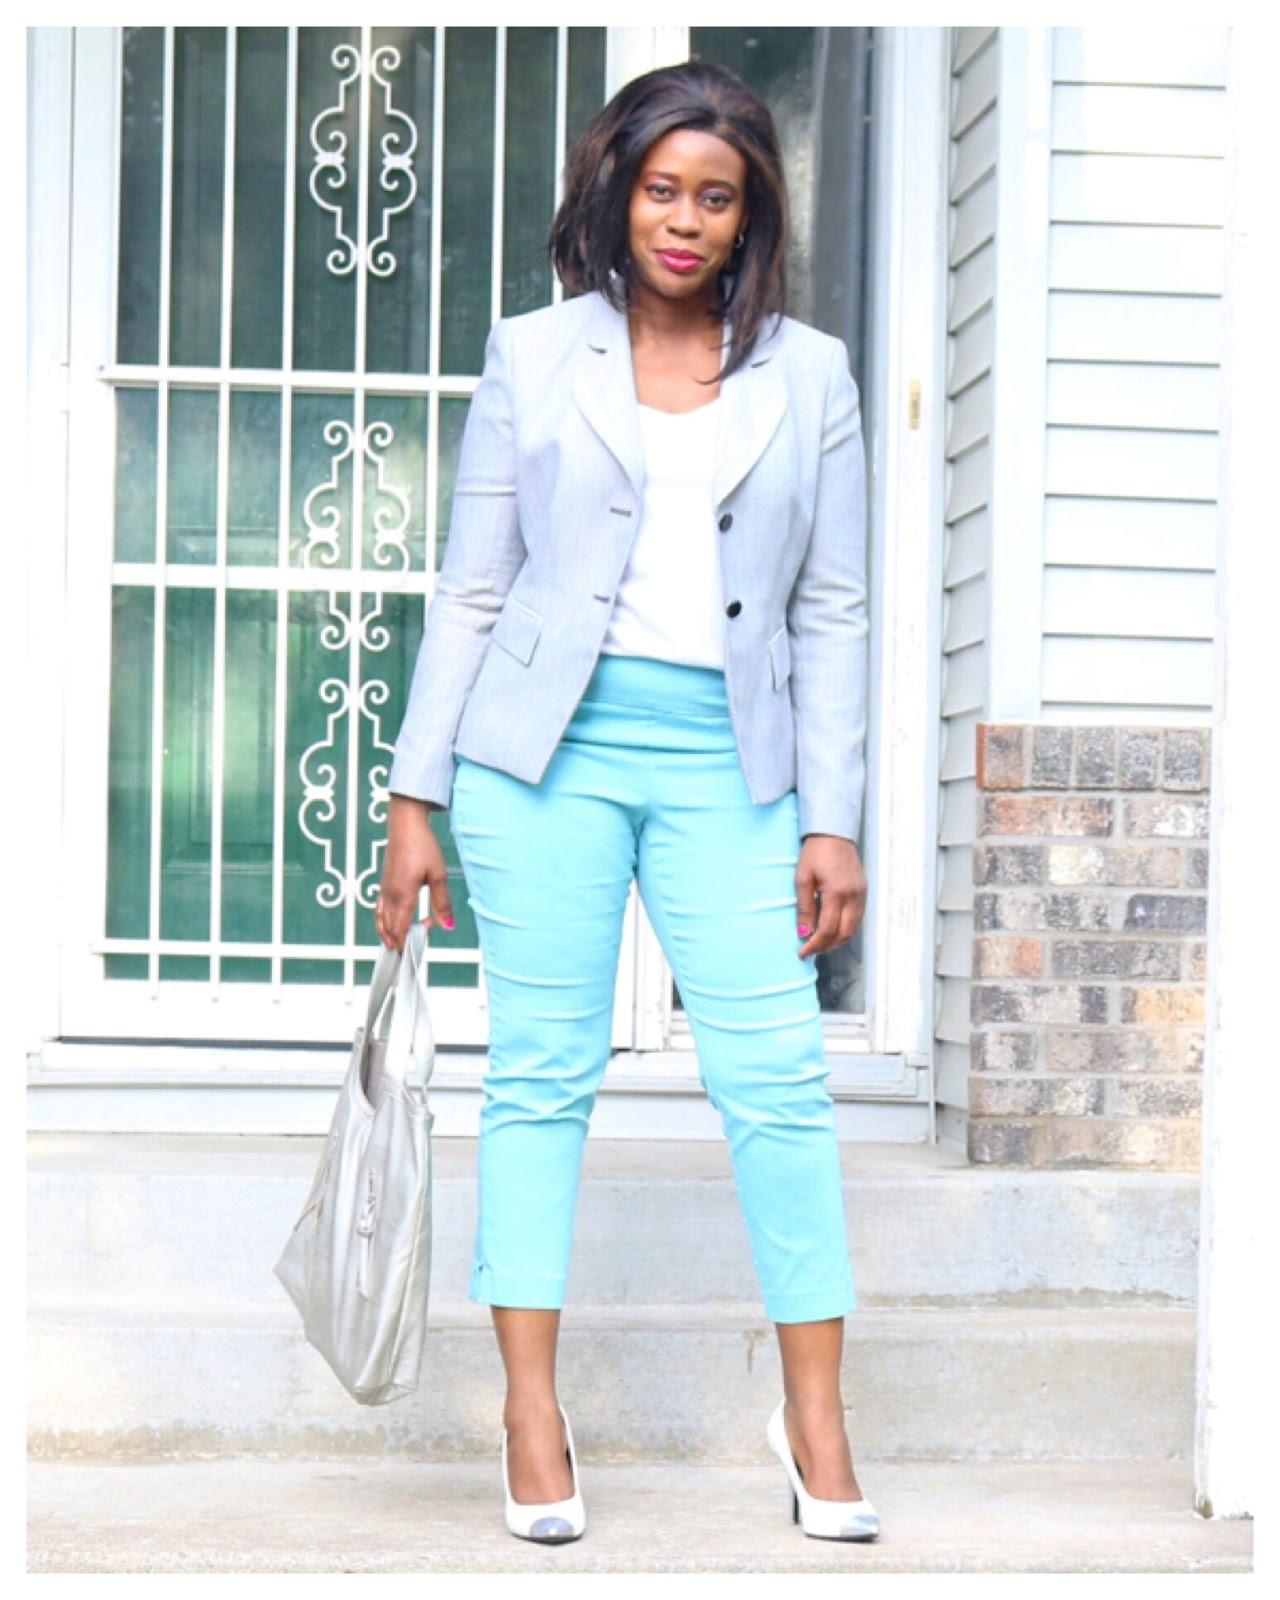 Fashion Beauty Zone: Beauty's Fashion Zone: Pastel's Work Style: Light Blue